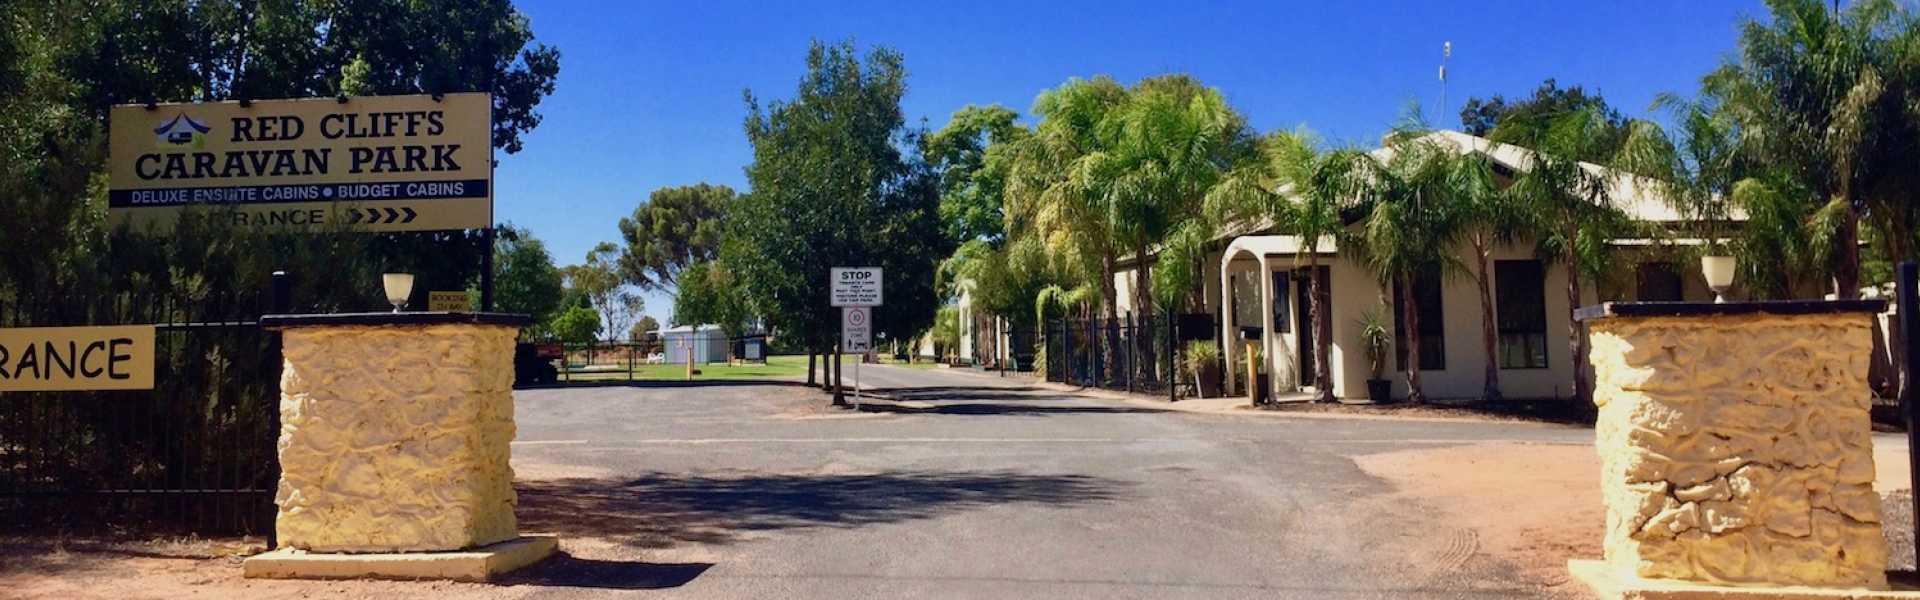 Kui Parks, Red Cliffs Caravan Park, Mildura, Entrance